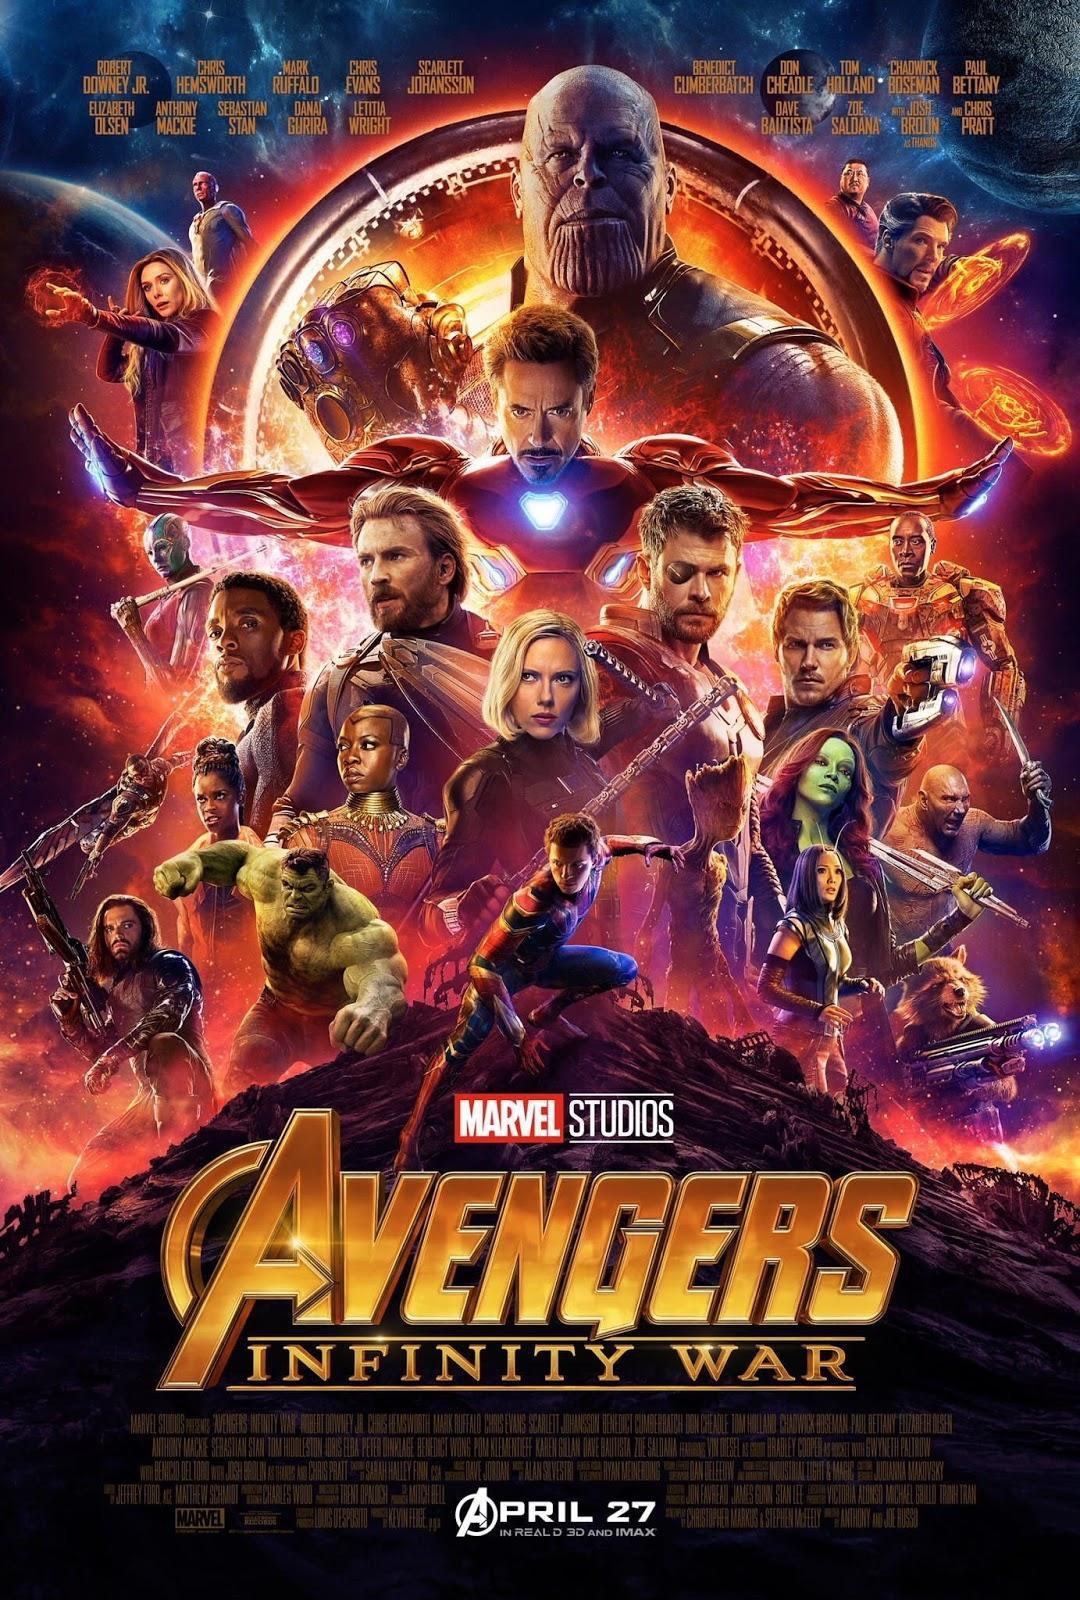 Avengers: Infinity War (2018) มหาสงครามอัญมณีล้างจักรวาล